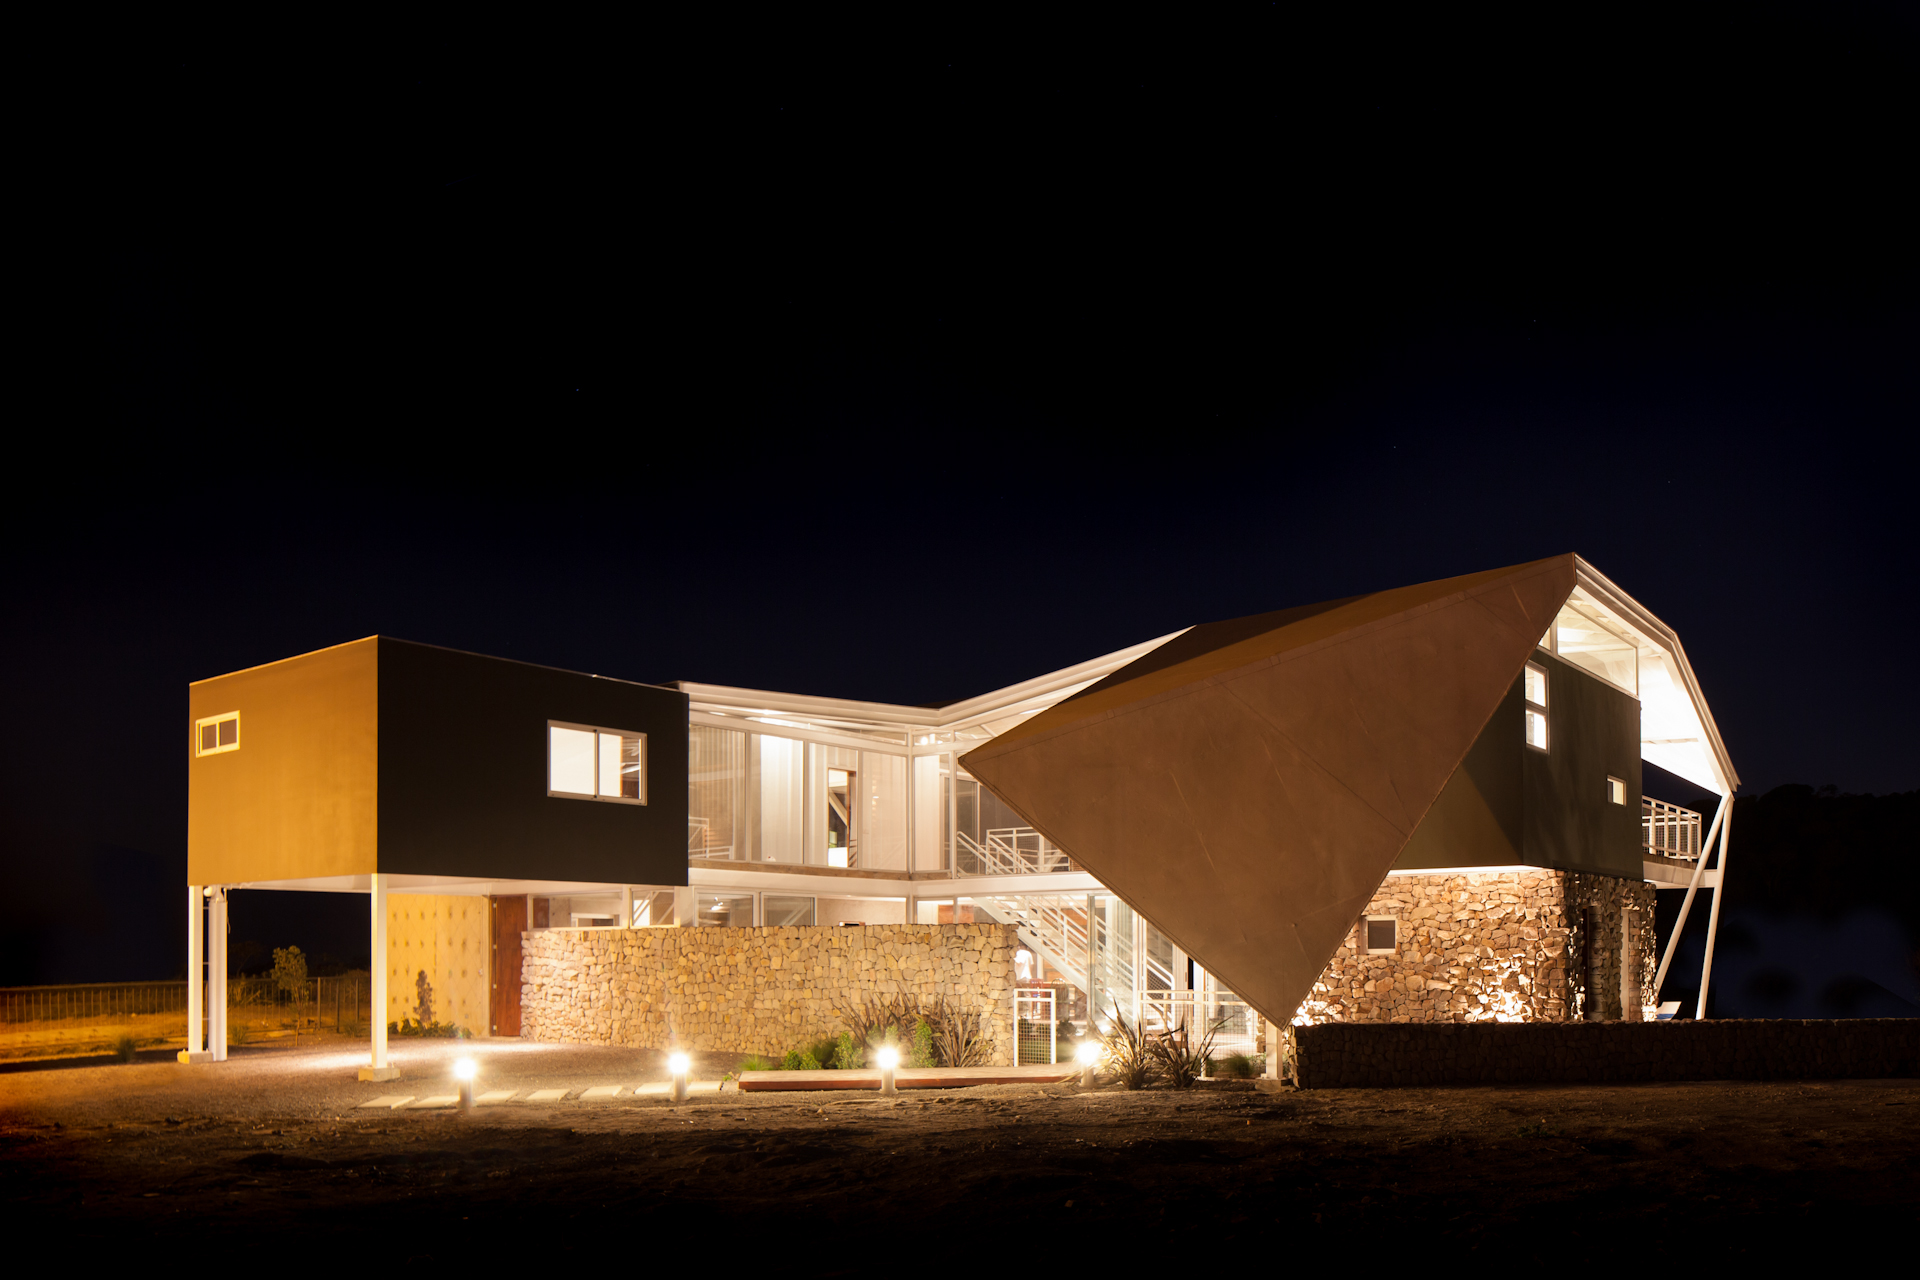 Architecture-Modern-La-Piscucha-El-Salvador-Dwell-Night-14.JPG